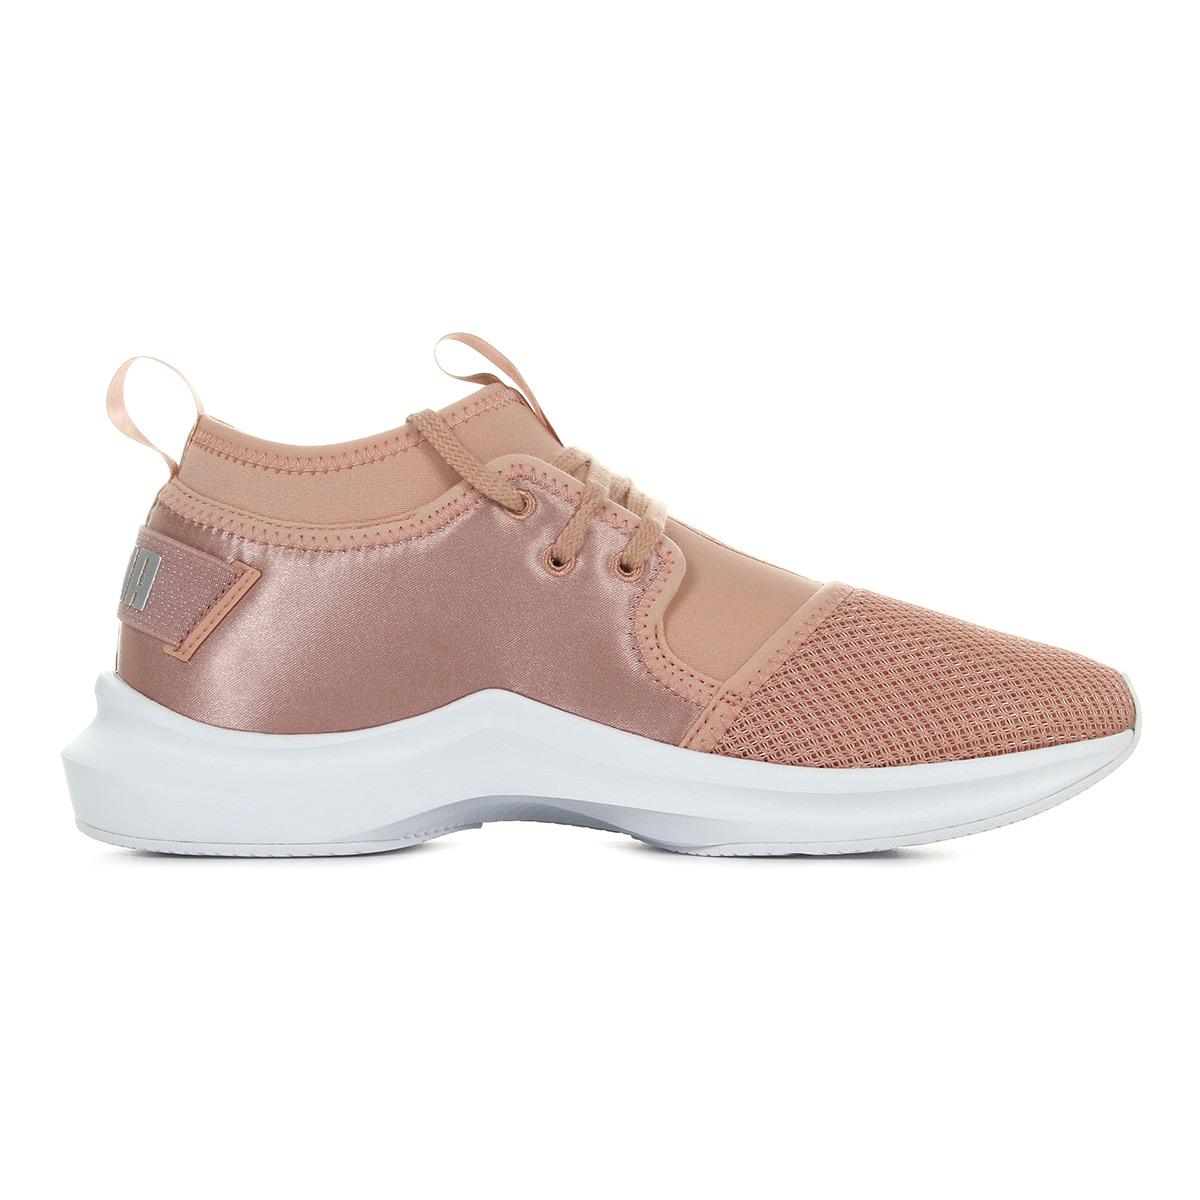 Dettagli su Chaussures Baskets Puma femme Phenom Low Satin EP Wn's taille Rose Synthétique